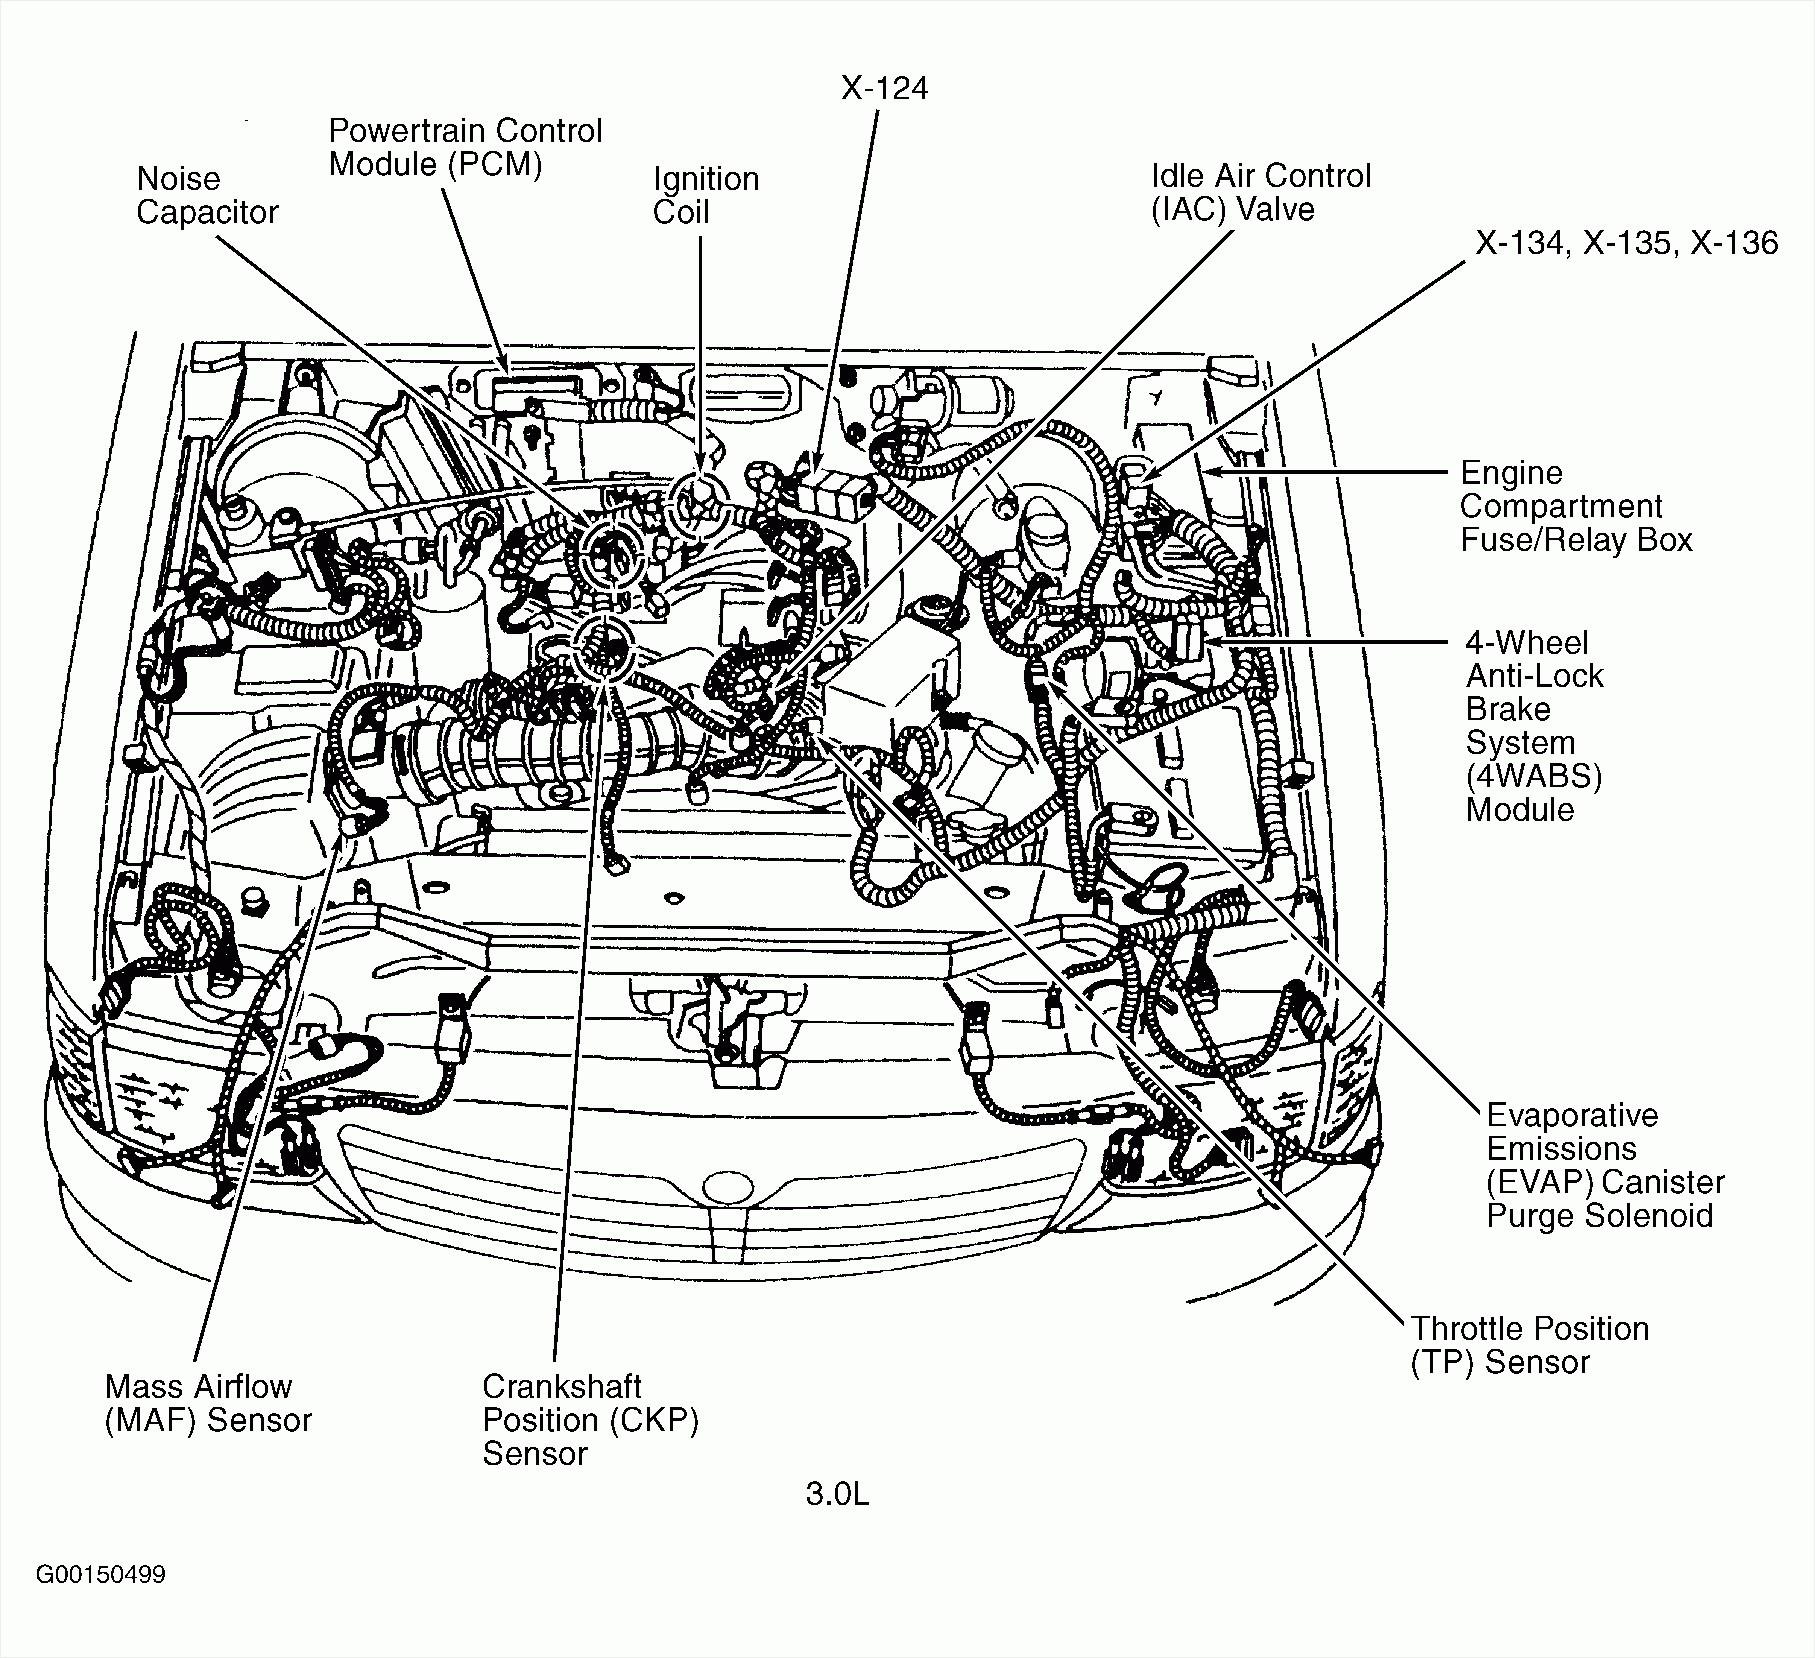 2003 Mitsubishi Fuso Wiring Diagram Mitsubishi Fuso Wiring Diagram